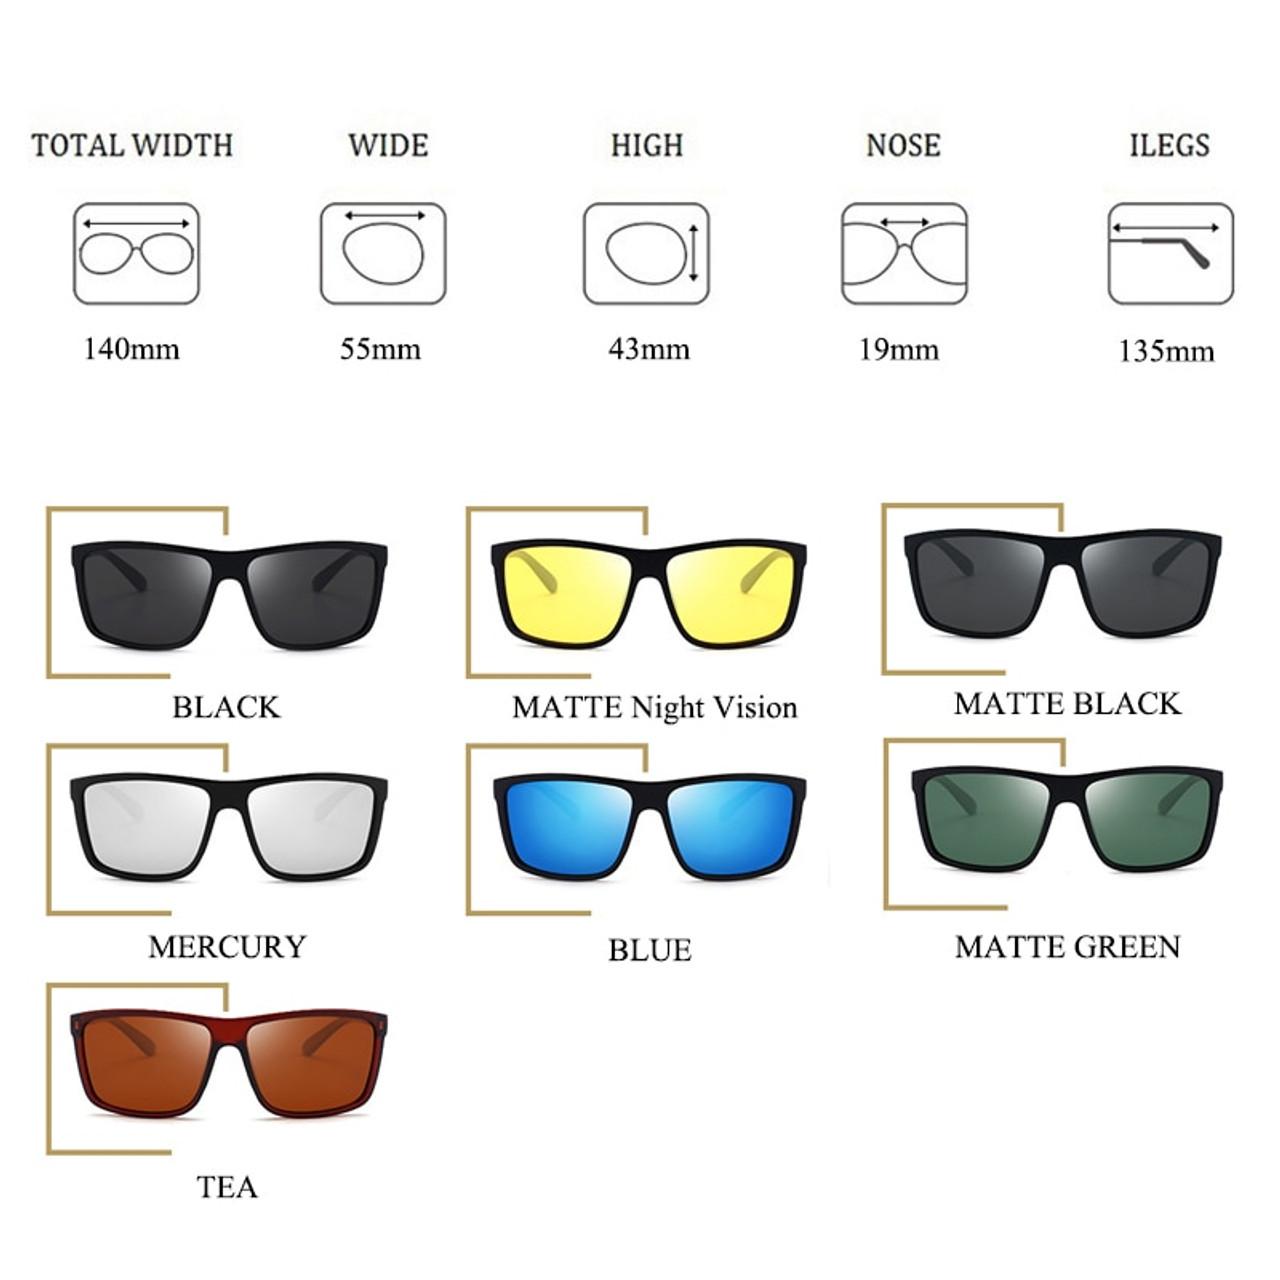 5de27be009 ... SIMPRECT 2019 Square Polarized Sunglasses Men UV400 High Quality Driving  Mirror Sun Glasses Vintage Lunette De ...